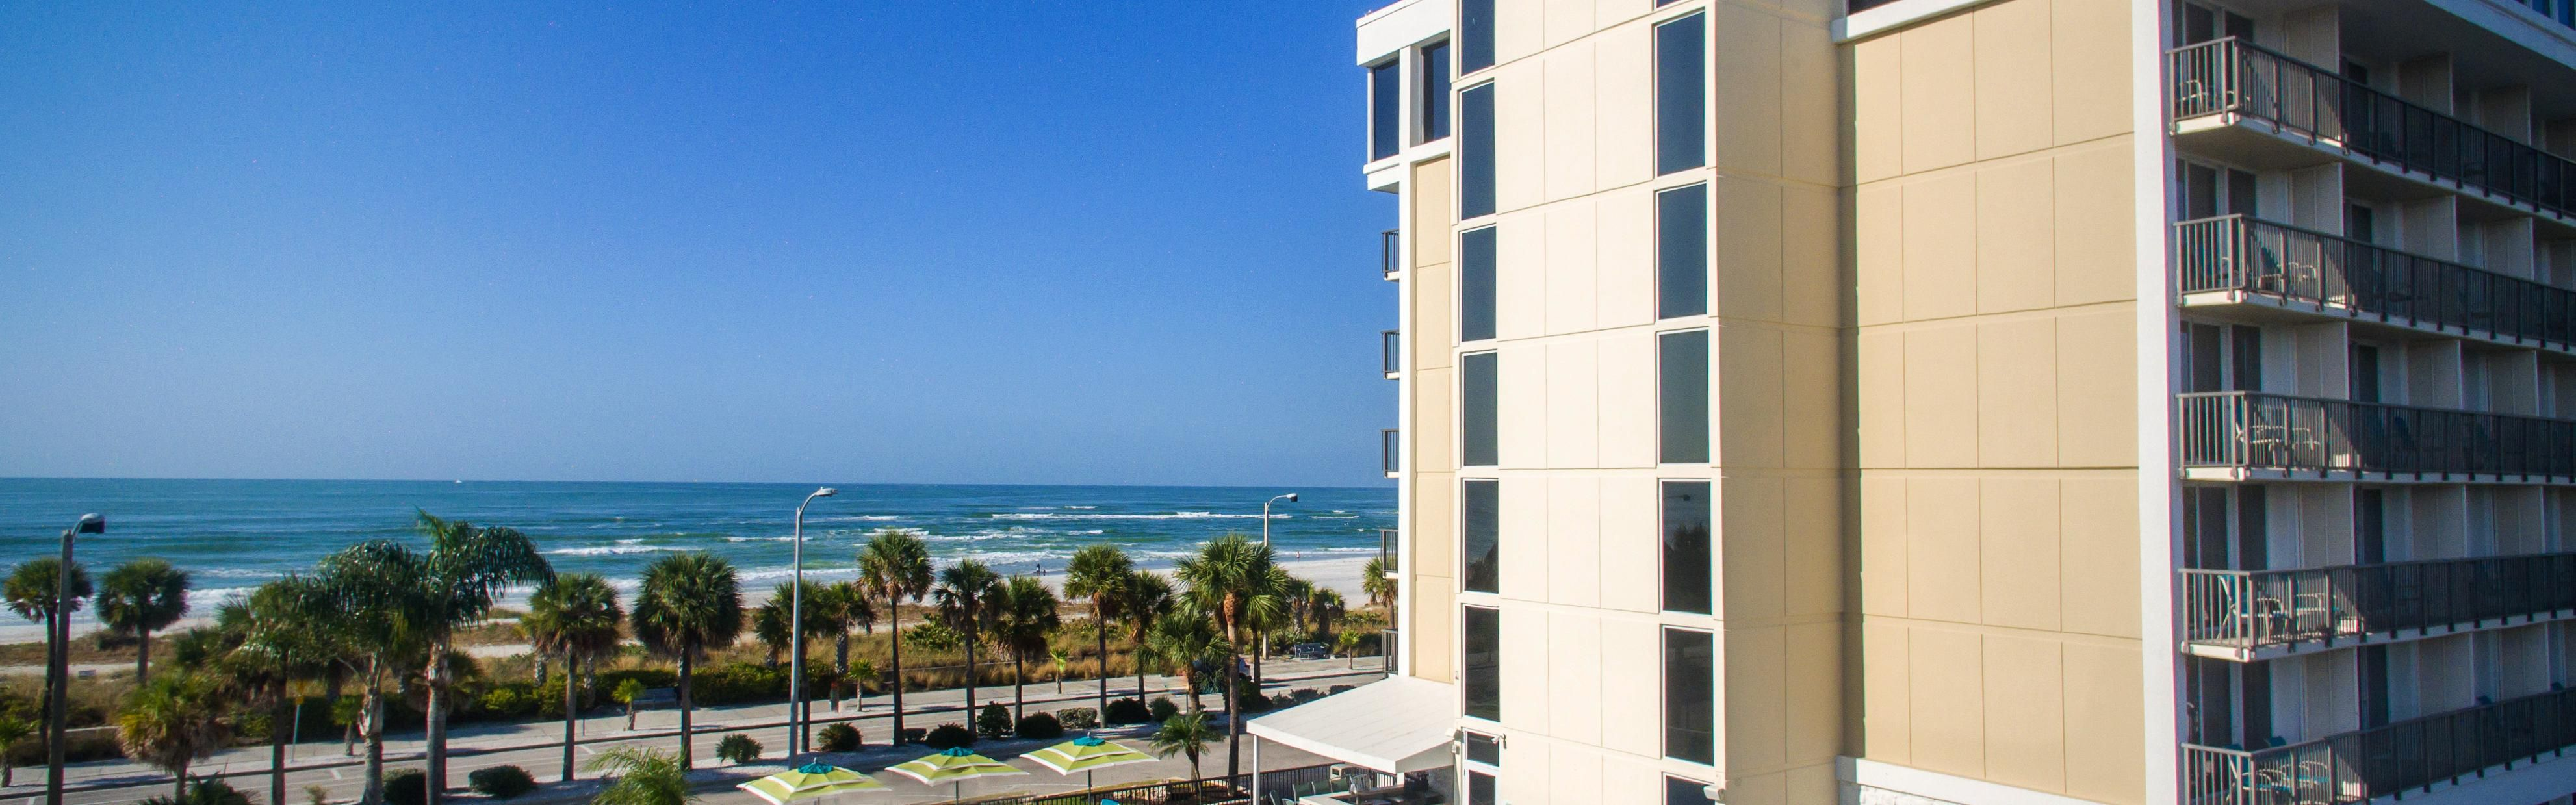 Holiday Inn Sarasota-Lido Beach-@The Beach image 2